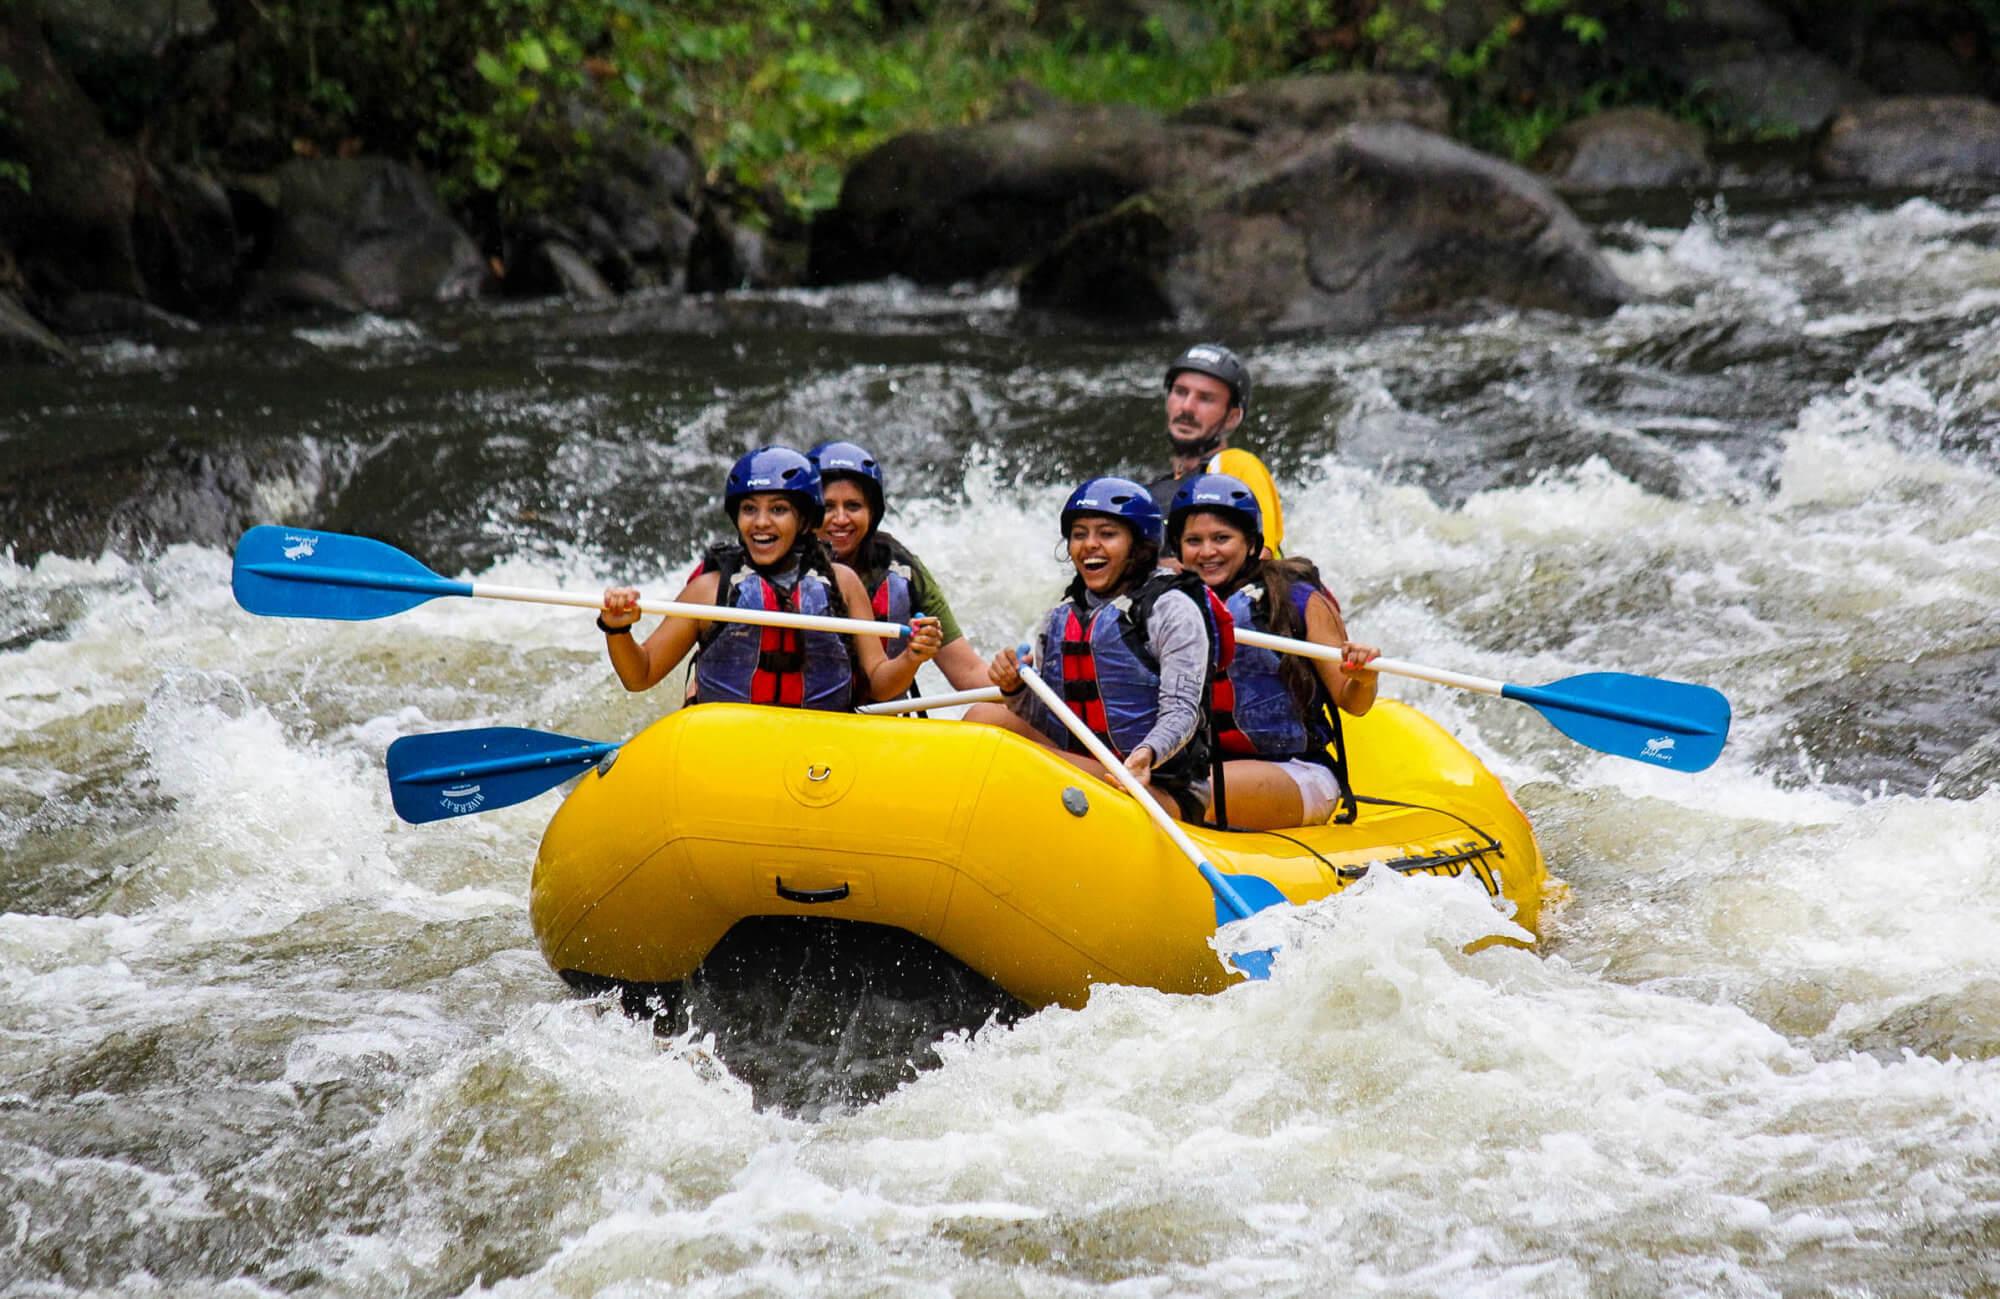 River Rat - Rafting in the Smokies